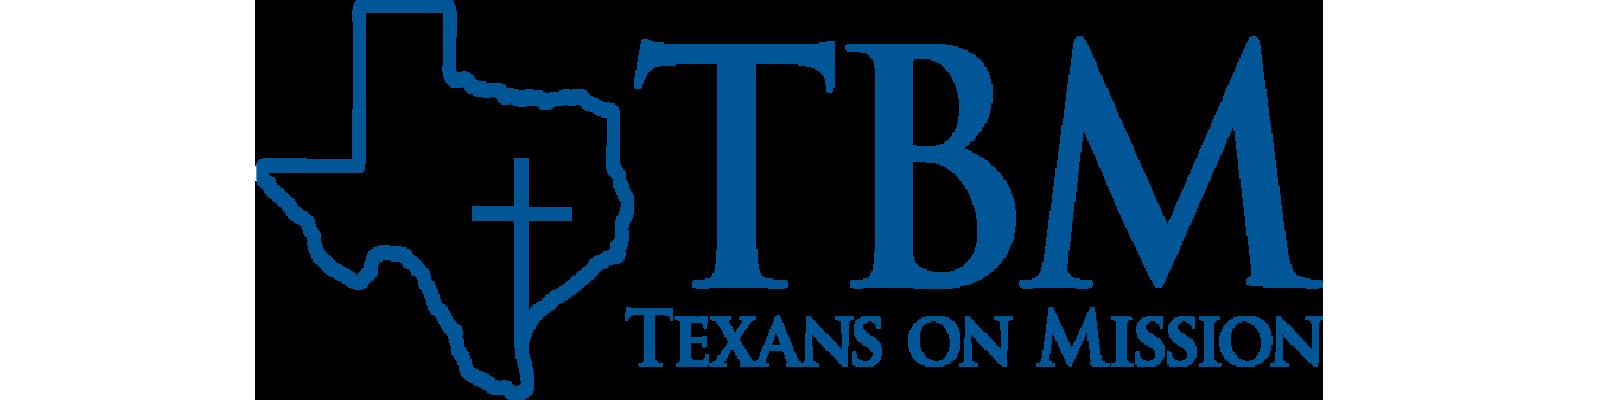 TexasBaptistMen-logo-FeaturedSize.png